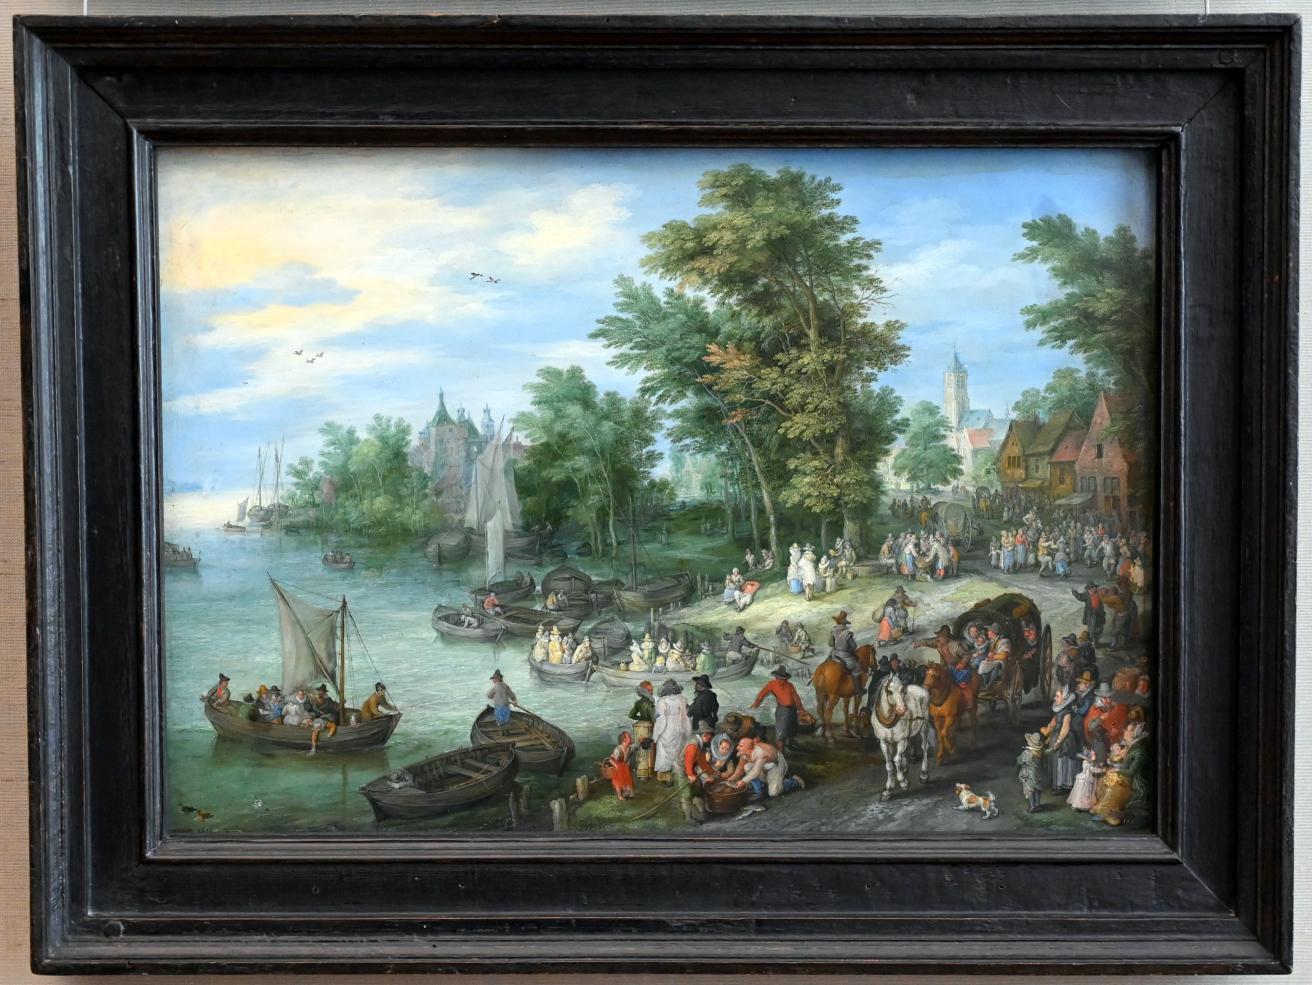 Jan Brueghel der Ältere (Blumenbrueghel): Landungsplatz, 1615